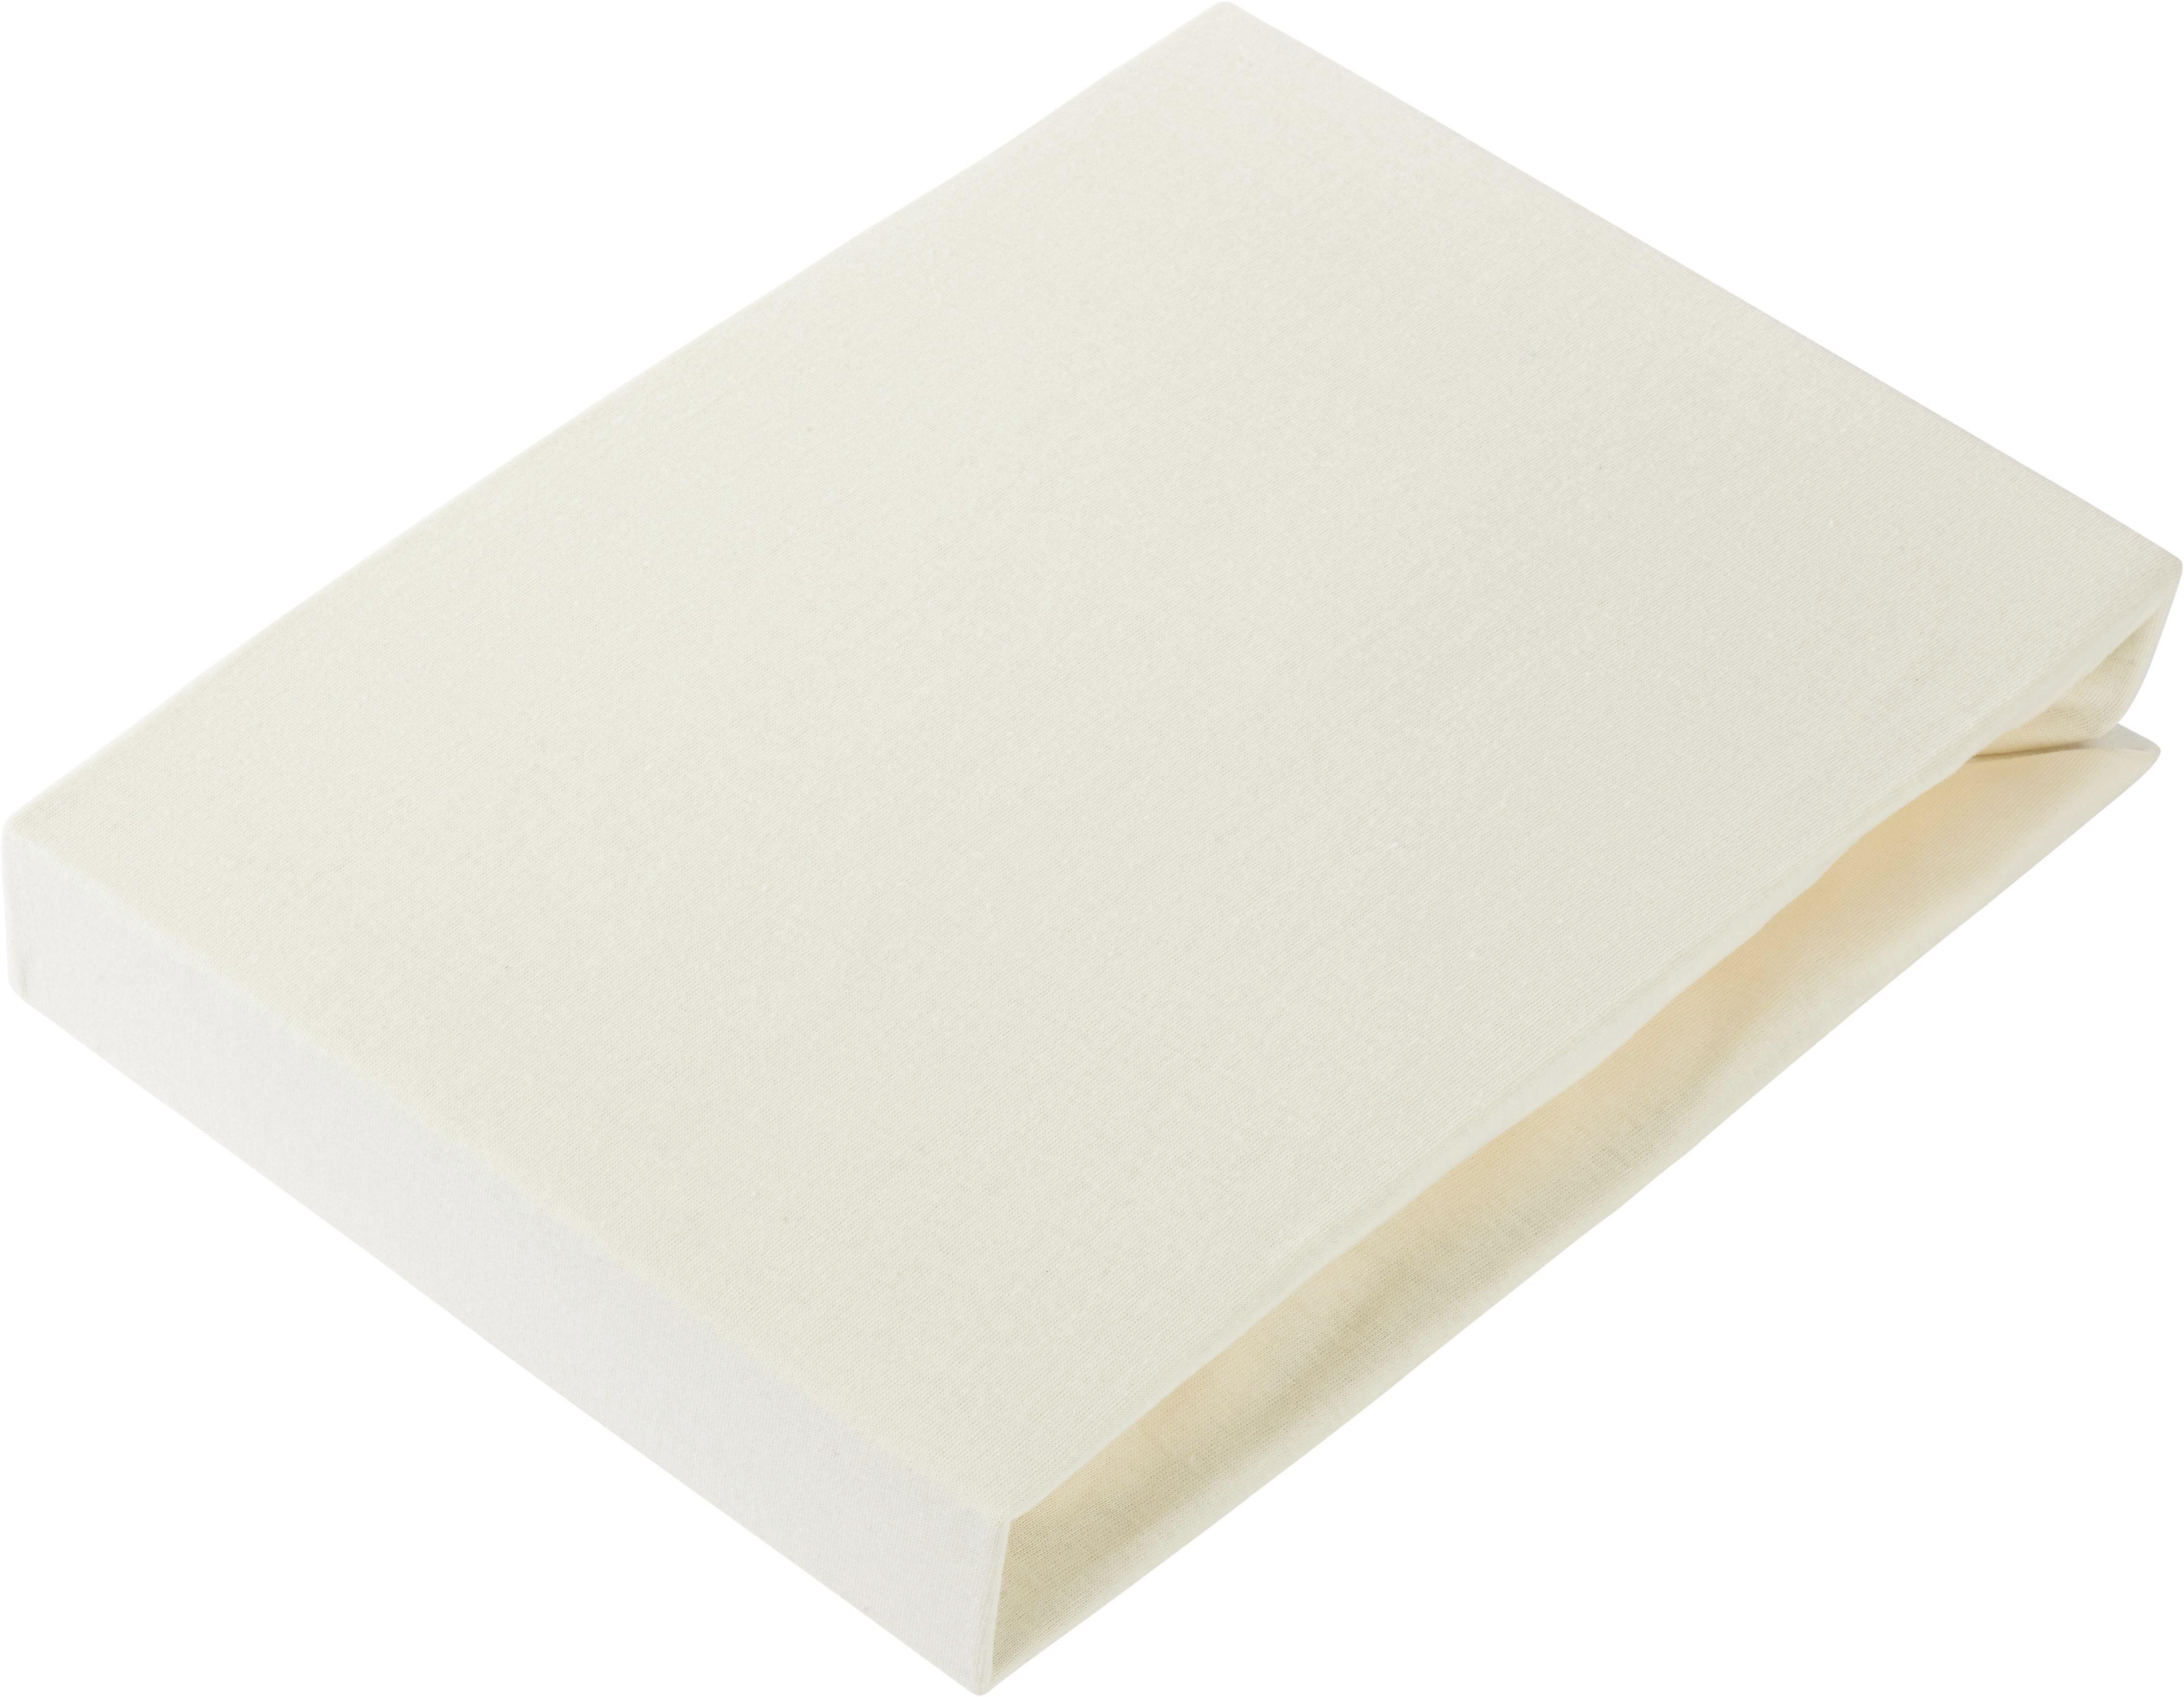 Spannbetttuch Basic In Ecru, ca. 180x200cm - Naturfarben, Textil (180/200cm) - MÖMAX modern living